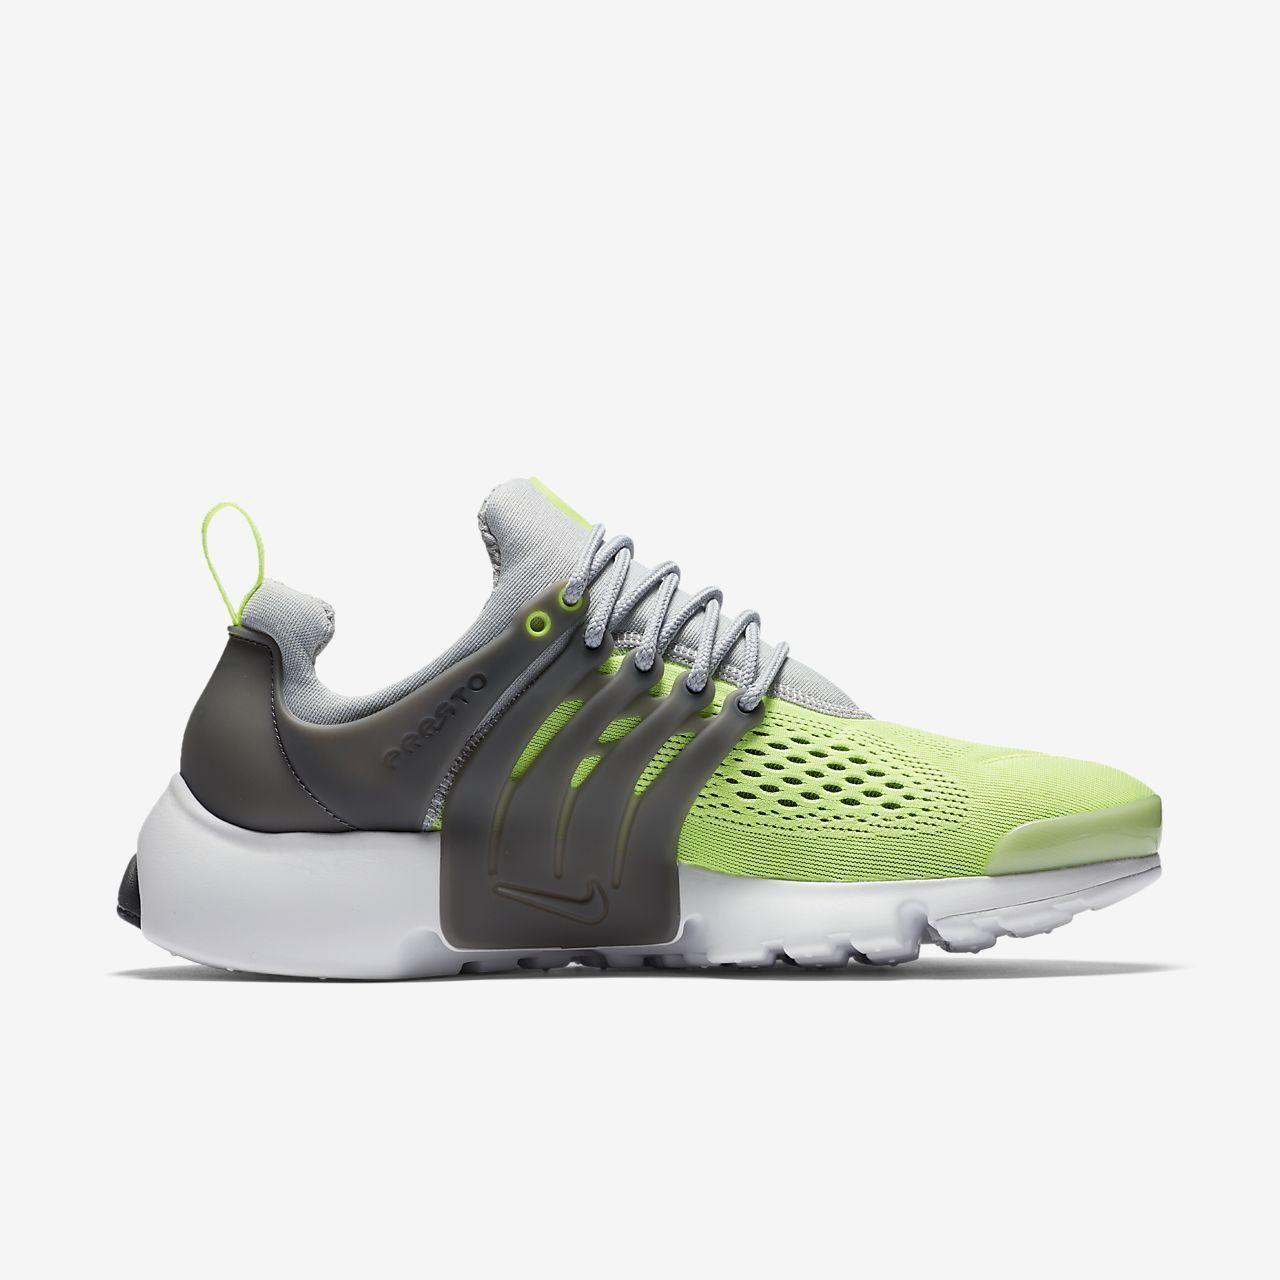 Most Popular Nike Air Huarache Run Ultra Wolf Grey Black Cool Grey White 819685 010 Women's Men's Running Shoes Trainers